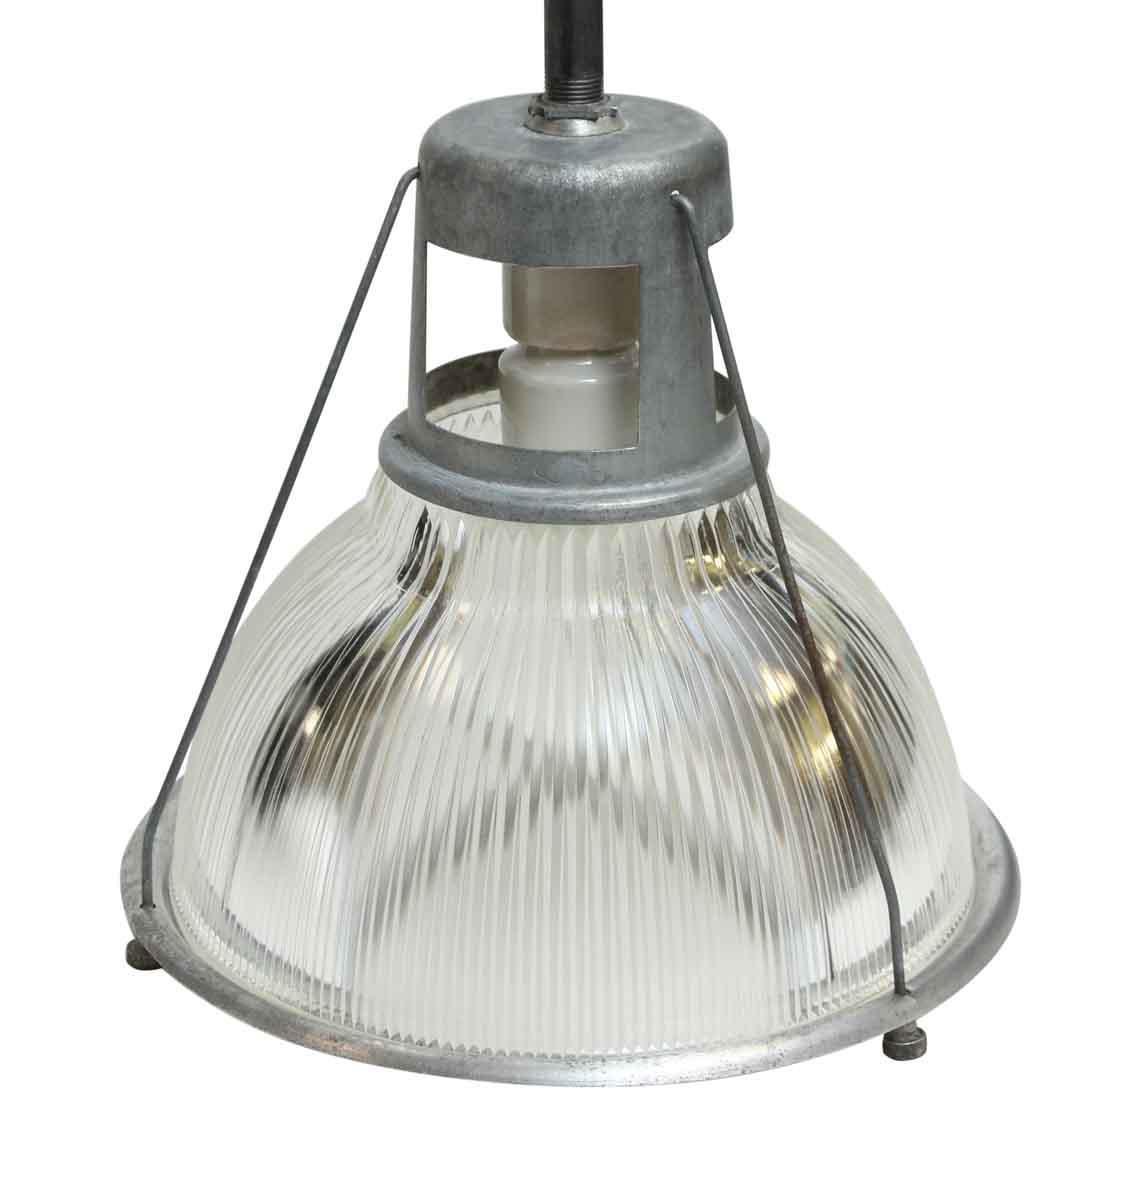 14  Industrial Holophane Factory Pendant Light - Image 8 ...  sc 1 st  Chairish & 14